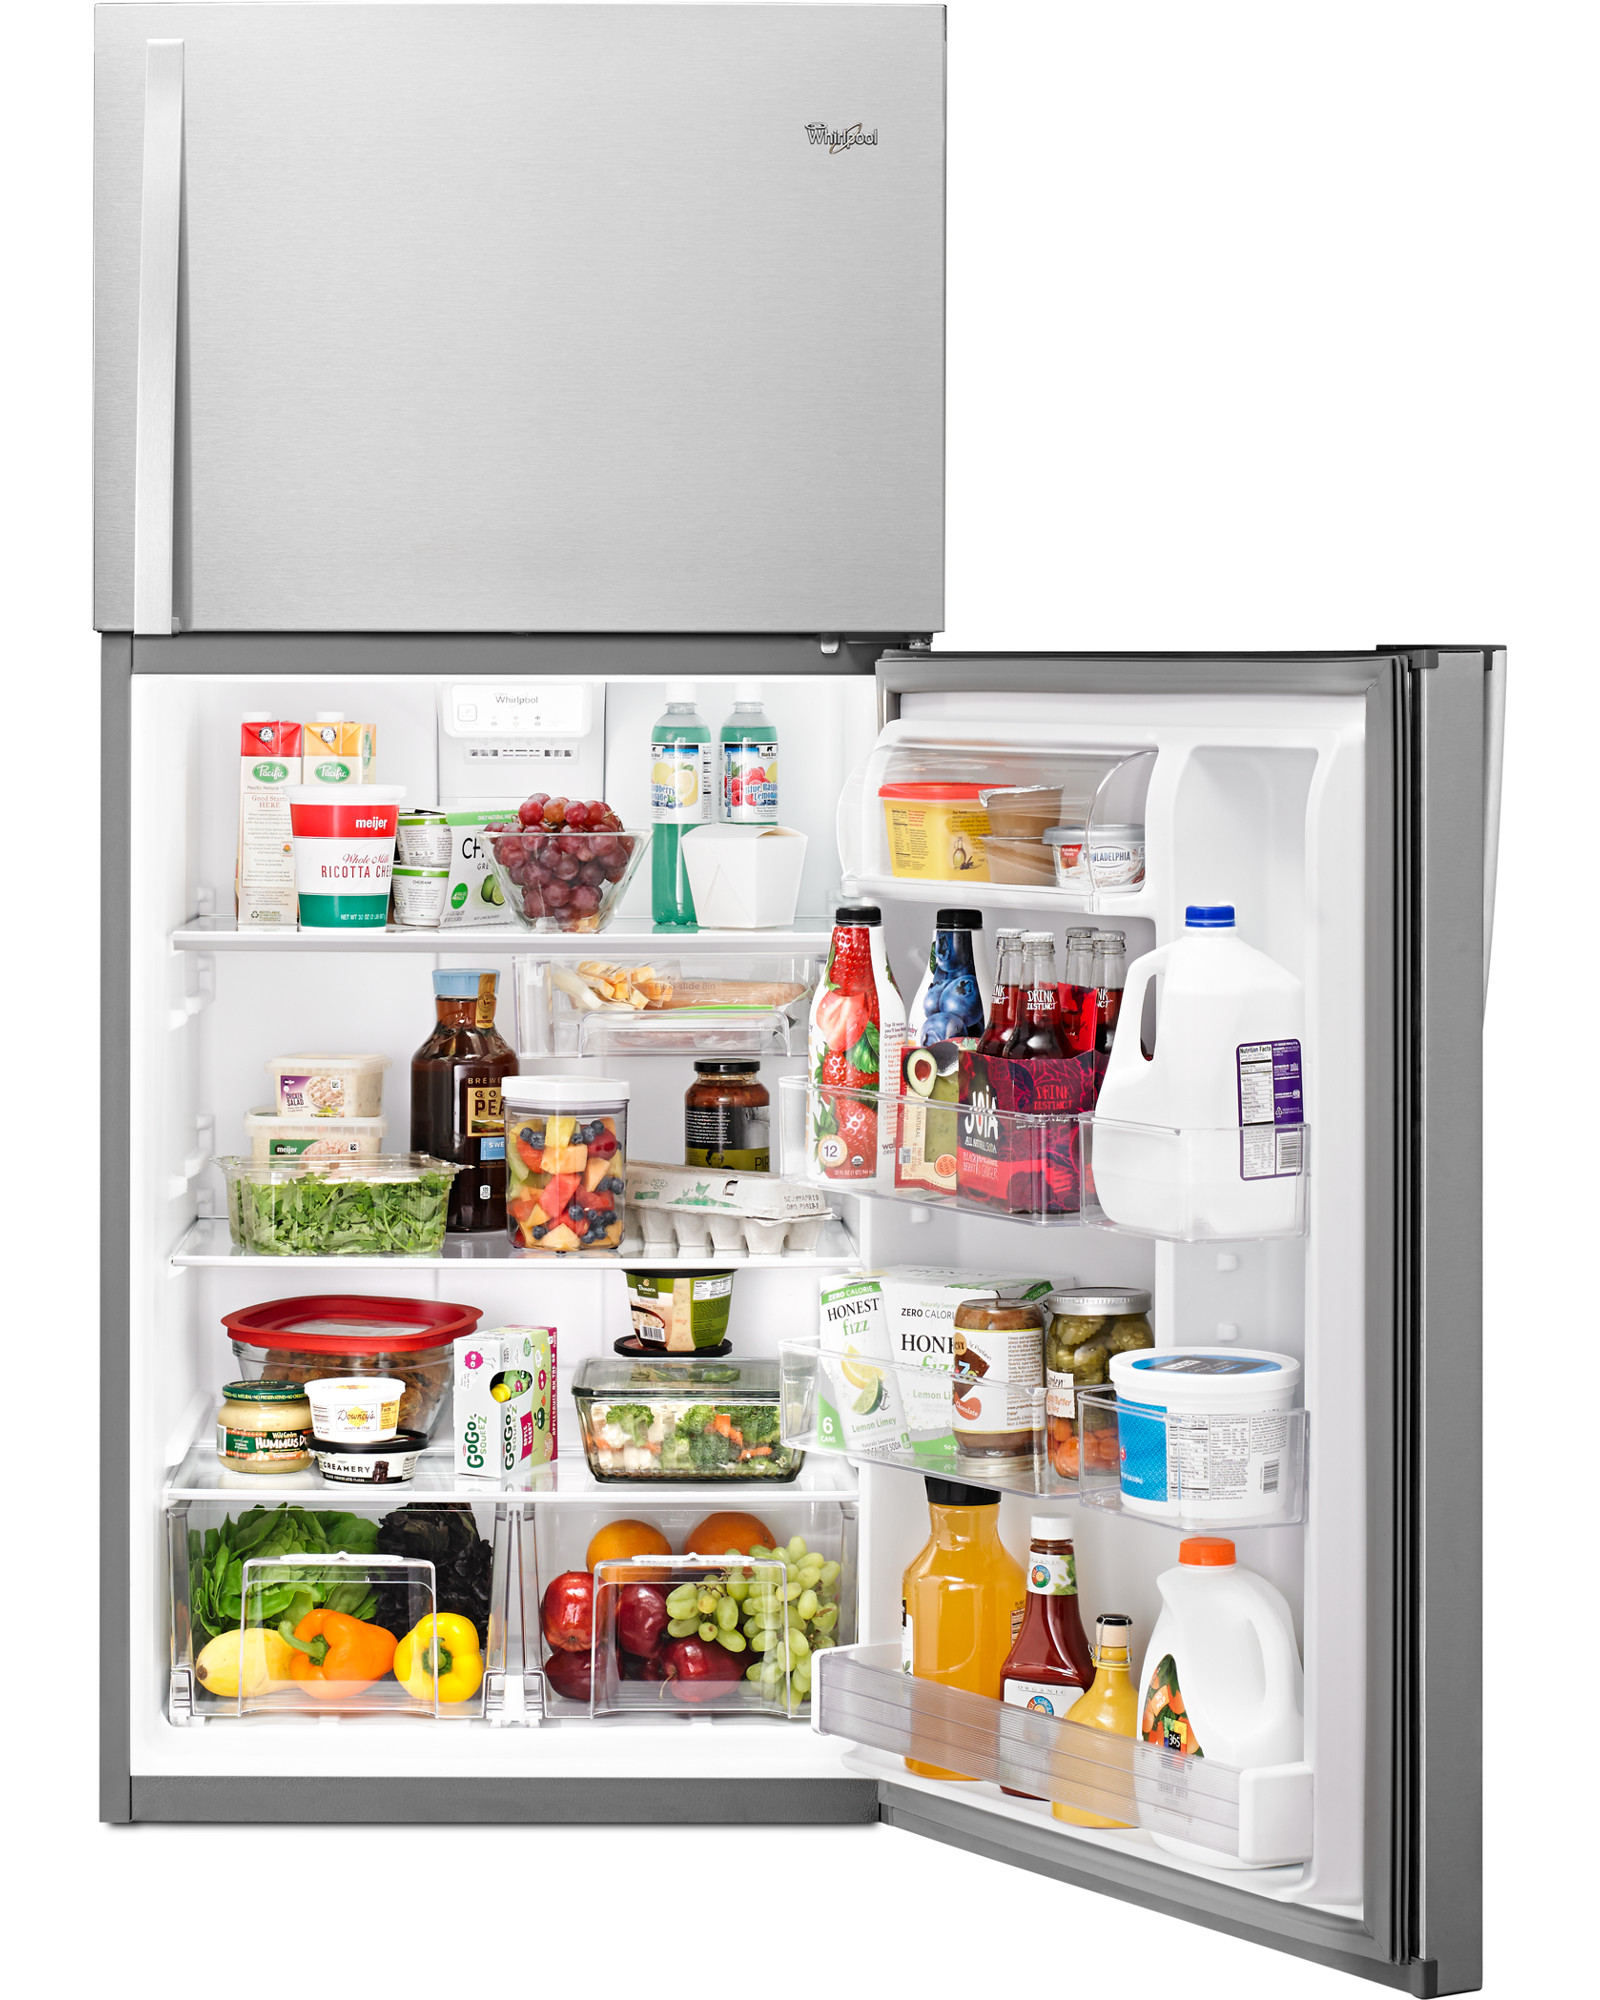 Whirlpool WRT519SZDM 19 cu. ft. Top Freezer Refrigerator w/ LED Interior Lighting - Stainless Steel